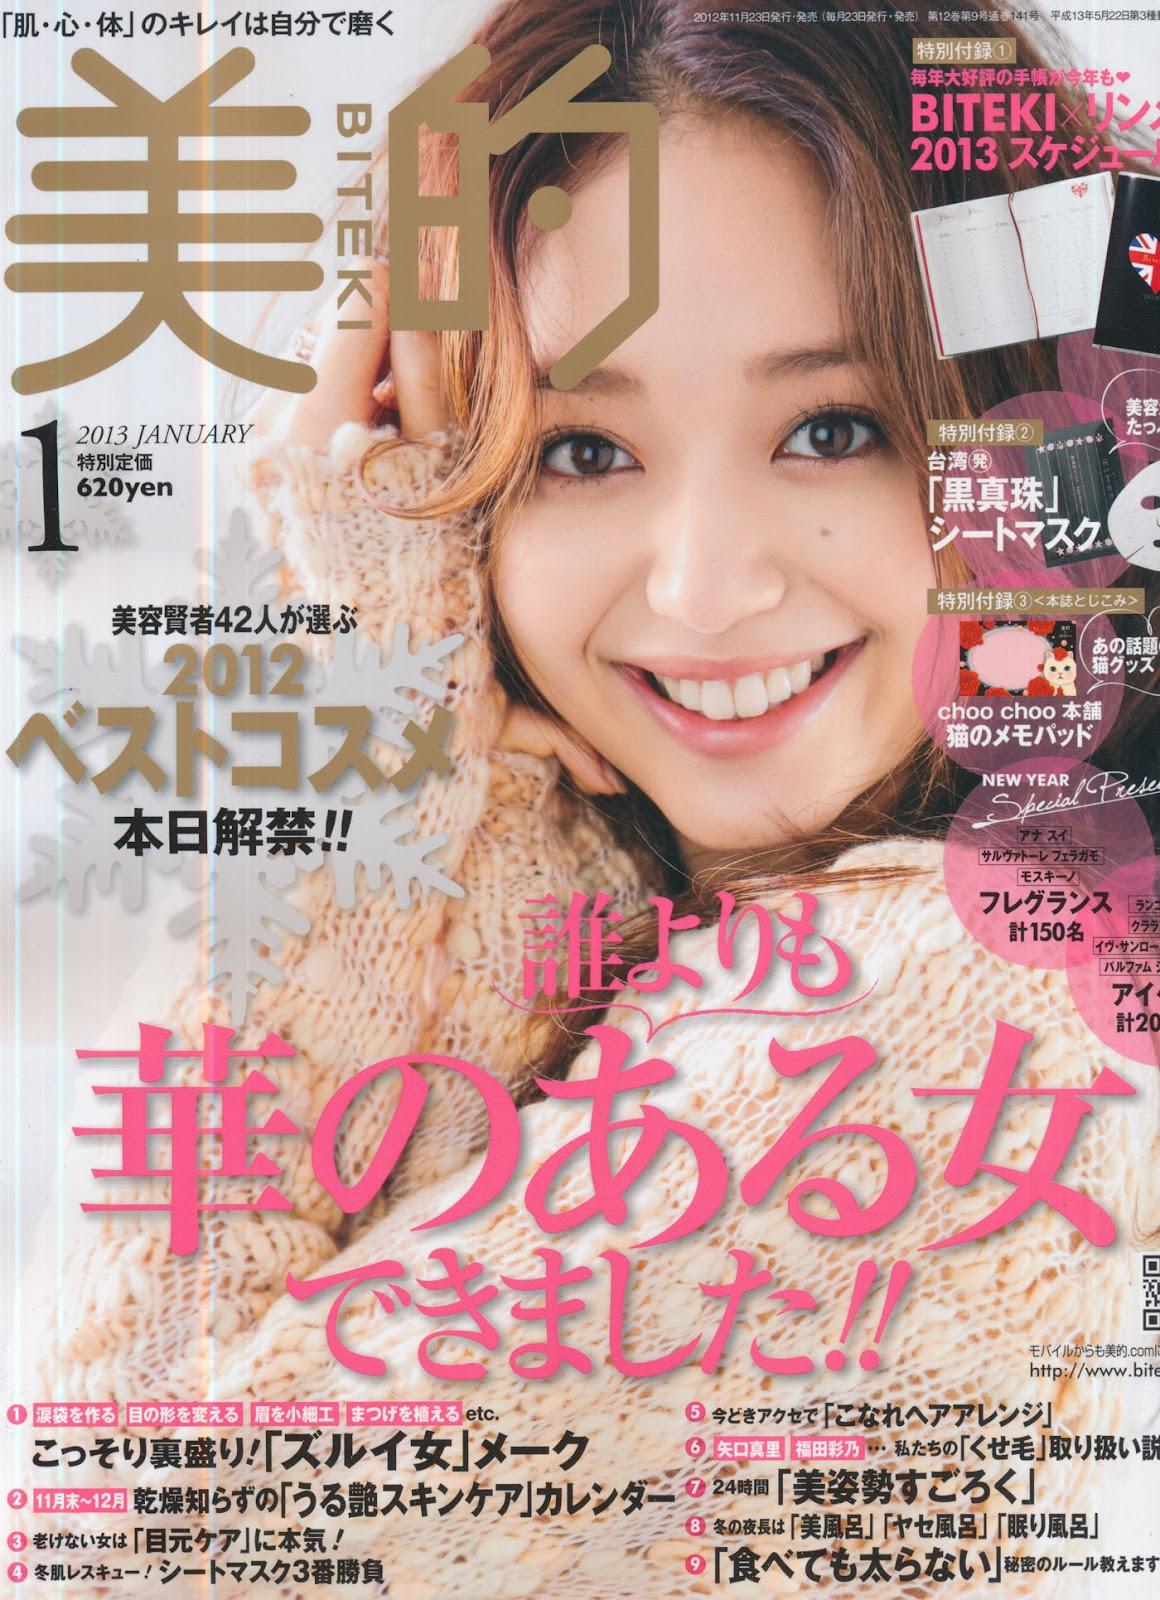 16 Issue Ls Magazine Bathing Beauties http://www.jmagazinescans.com